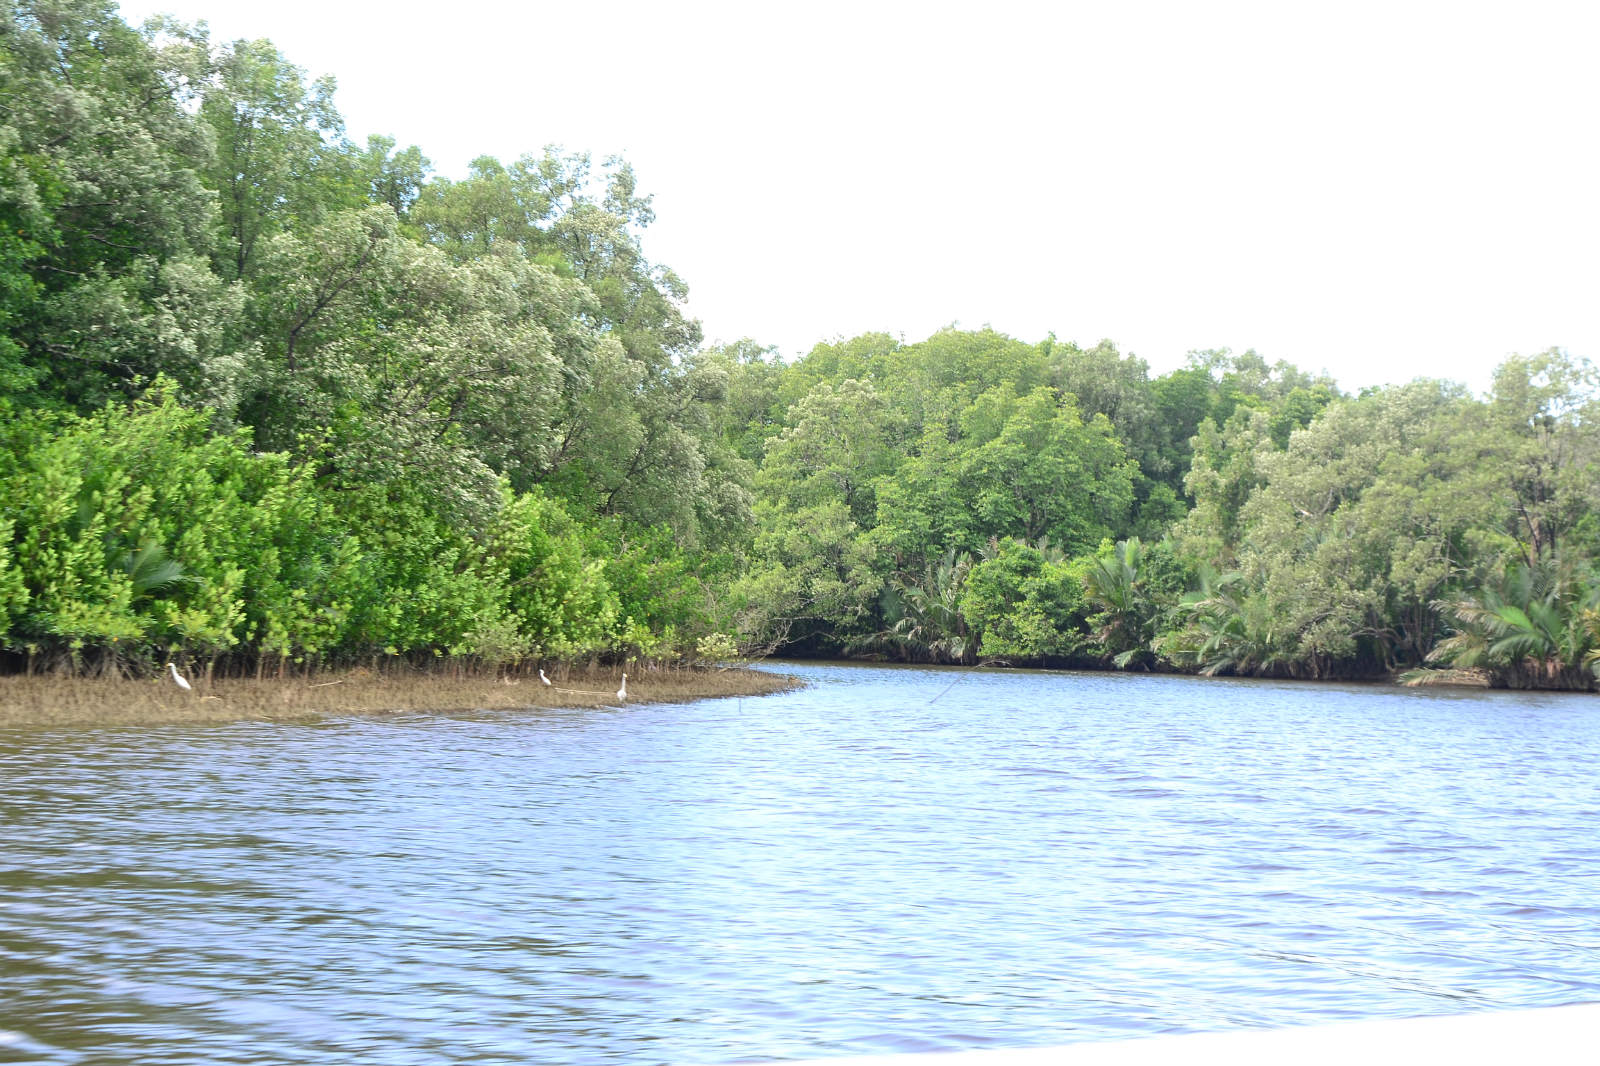 du lịch kota kinabalu - rừng ngập mặn